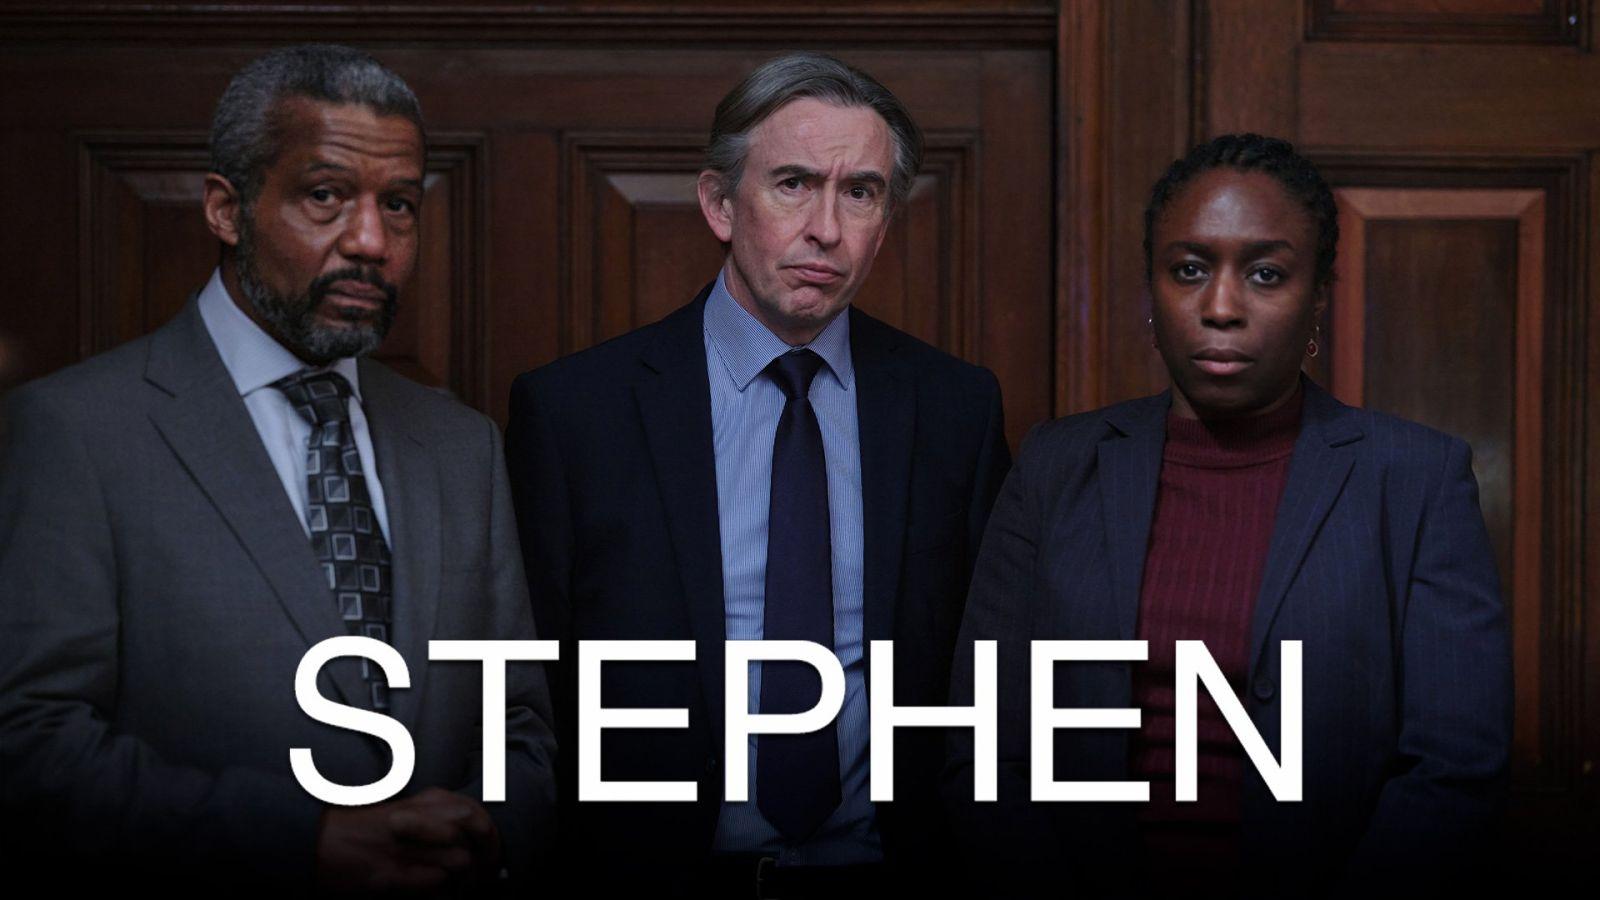 ITV's STEPHEN with Michael Akinsulire